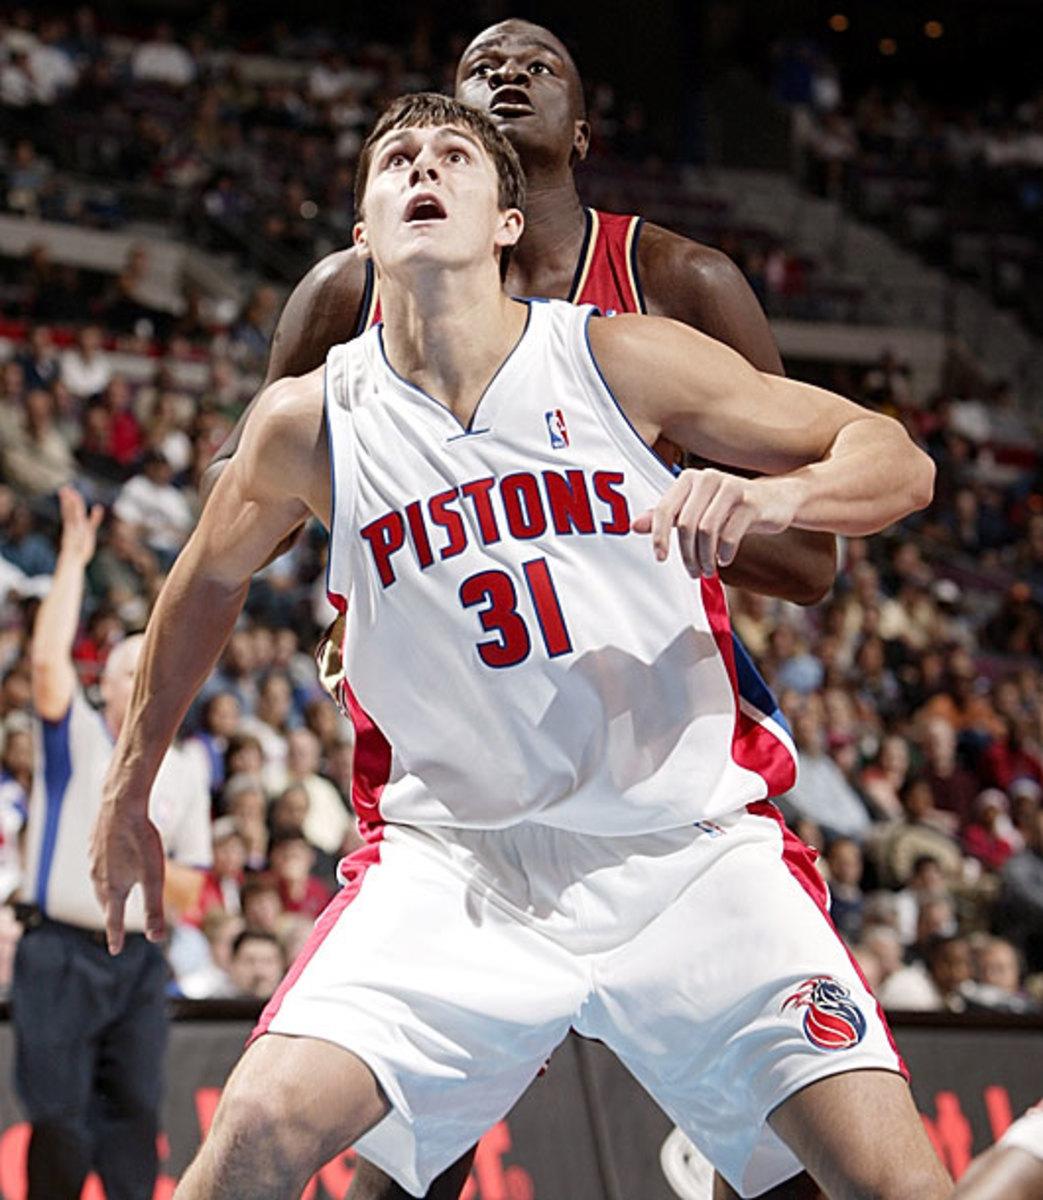 Darko Milicic, Pistons